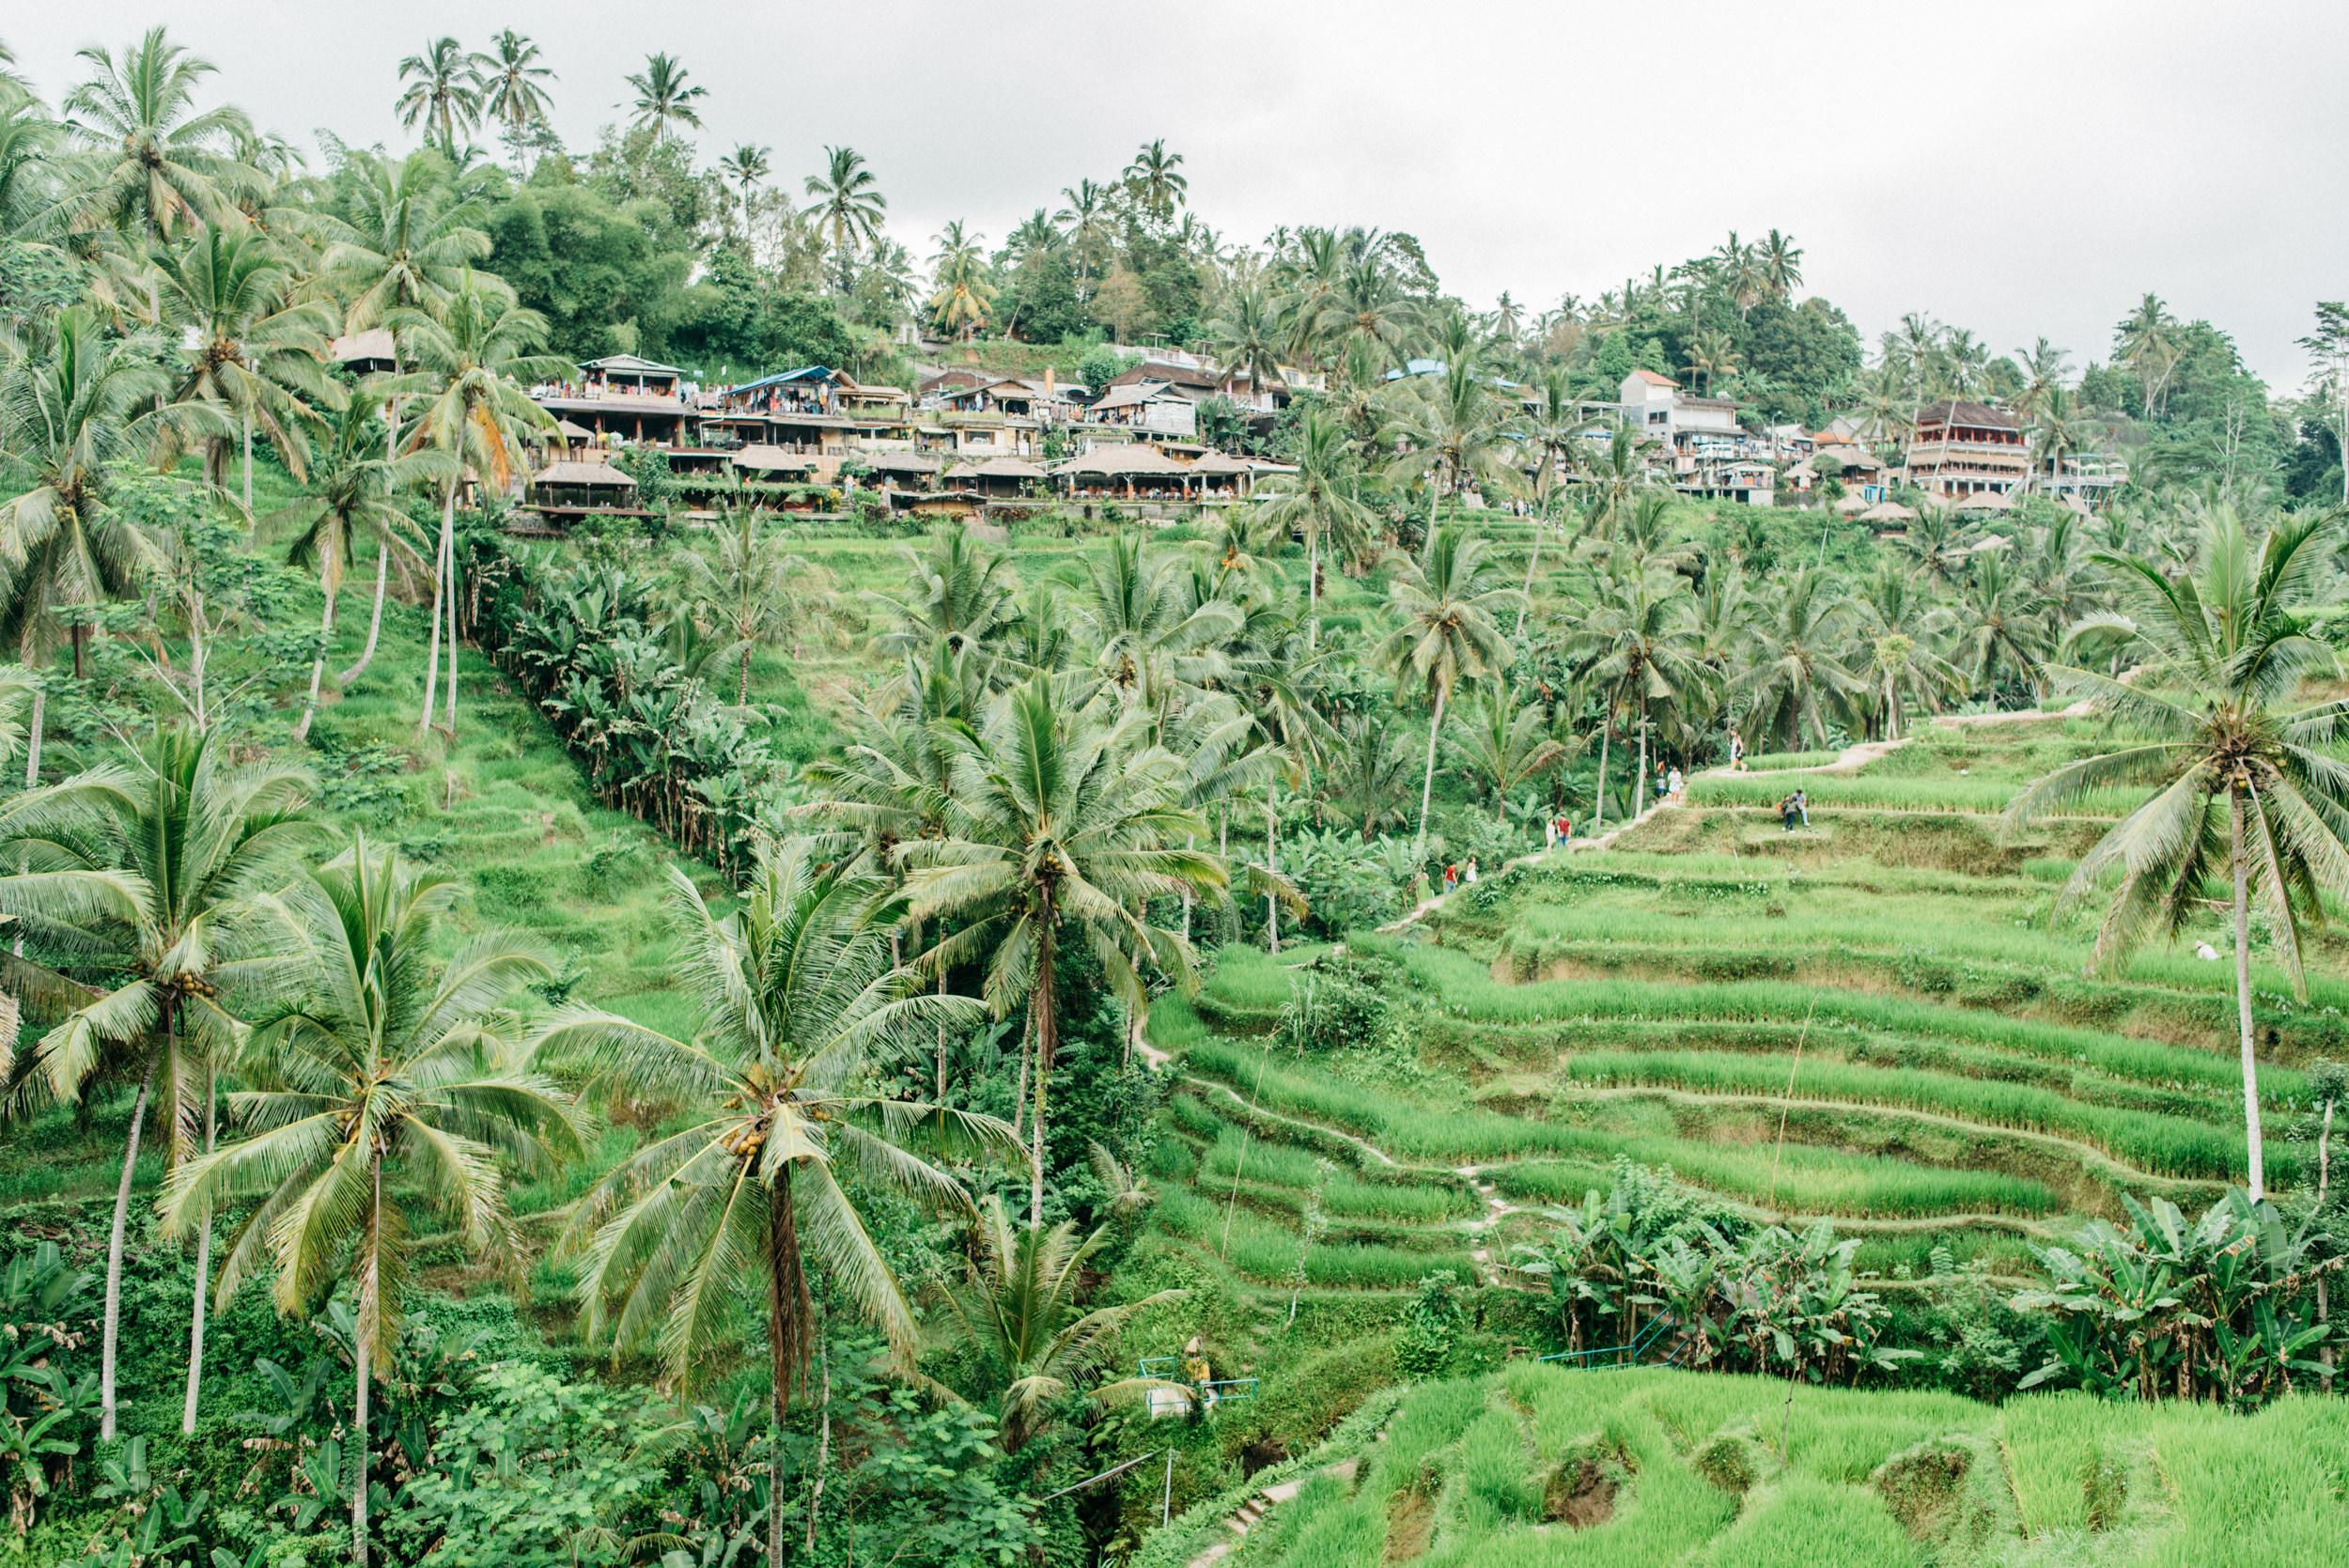 Rice Paddies & Coconut Trees - Tegalalang Rice Terrace, Bali